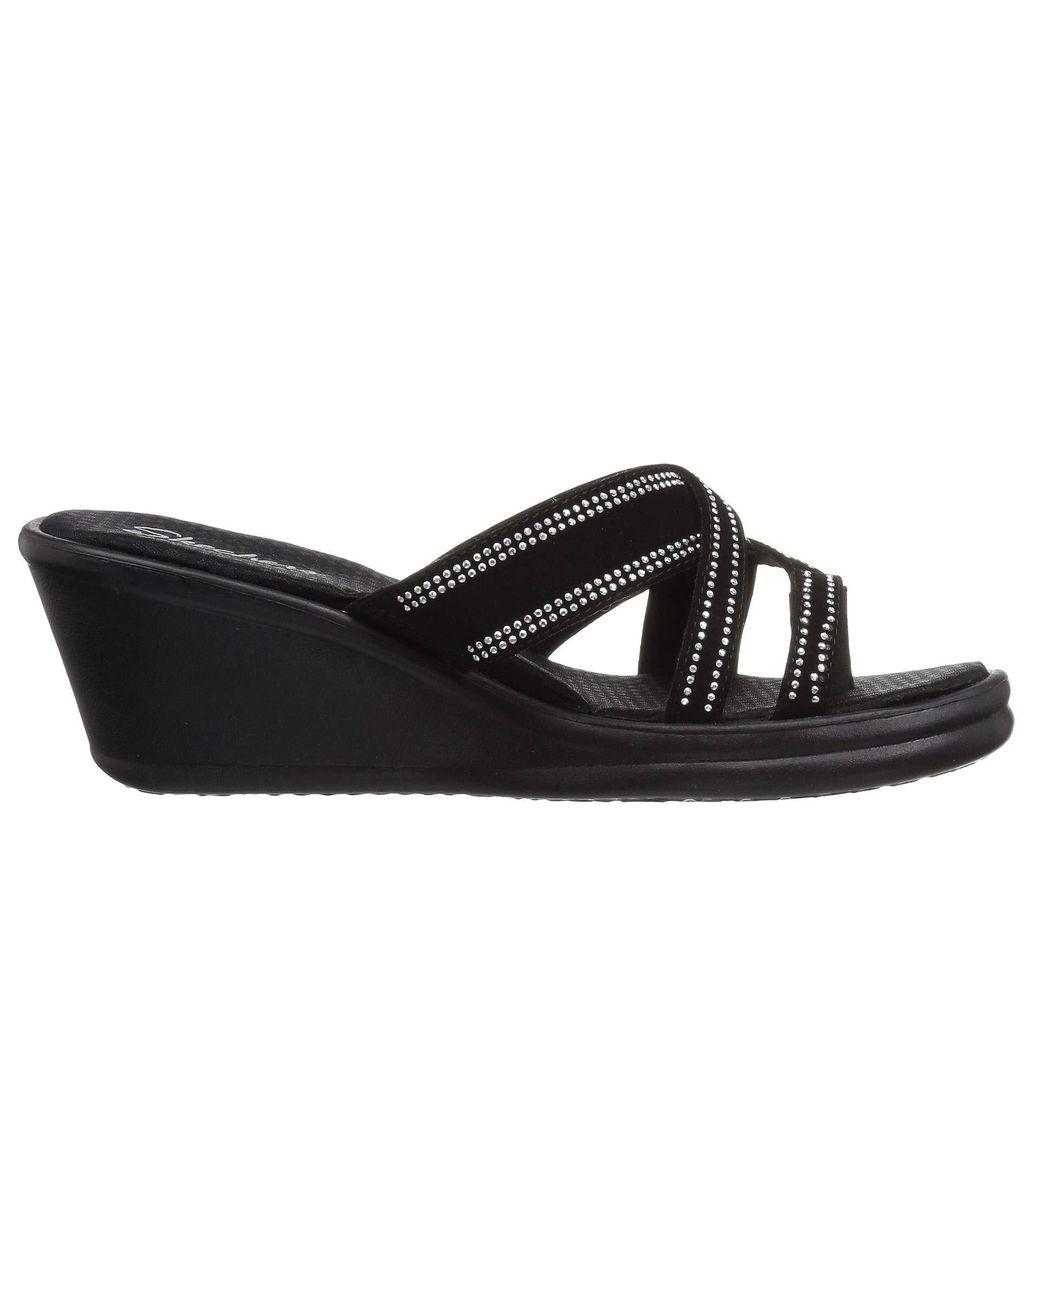 50393459a575 Lyst - Skechers Rumblers-cali Spell-studded Multi Strap Slide With Memory  Foam Wedge Sandal in Black - Save 3%